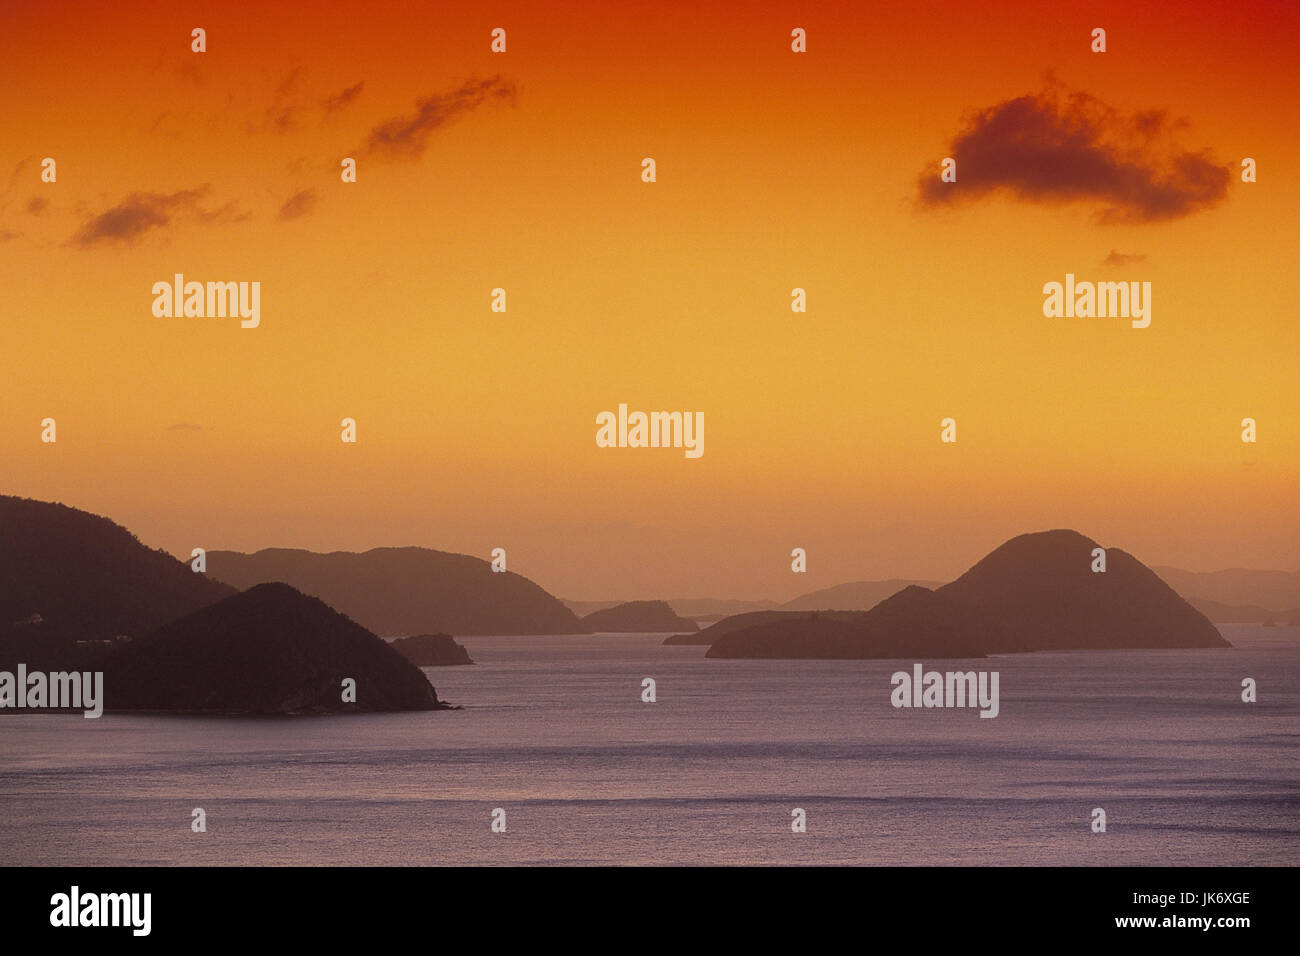 Karibik, Britische Jungferninseln, Tortola, Cane Garden Bay, Blick Jost Van Dyke, Meer, Abendlicht Mittelamerika, Stockbild